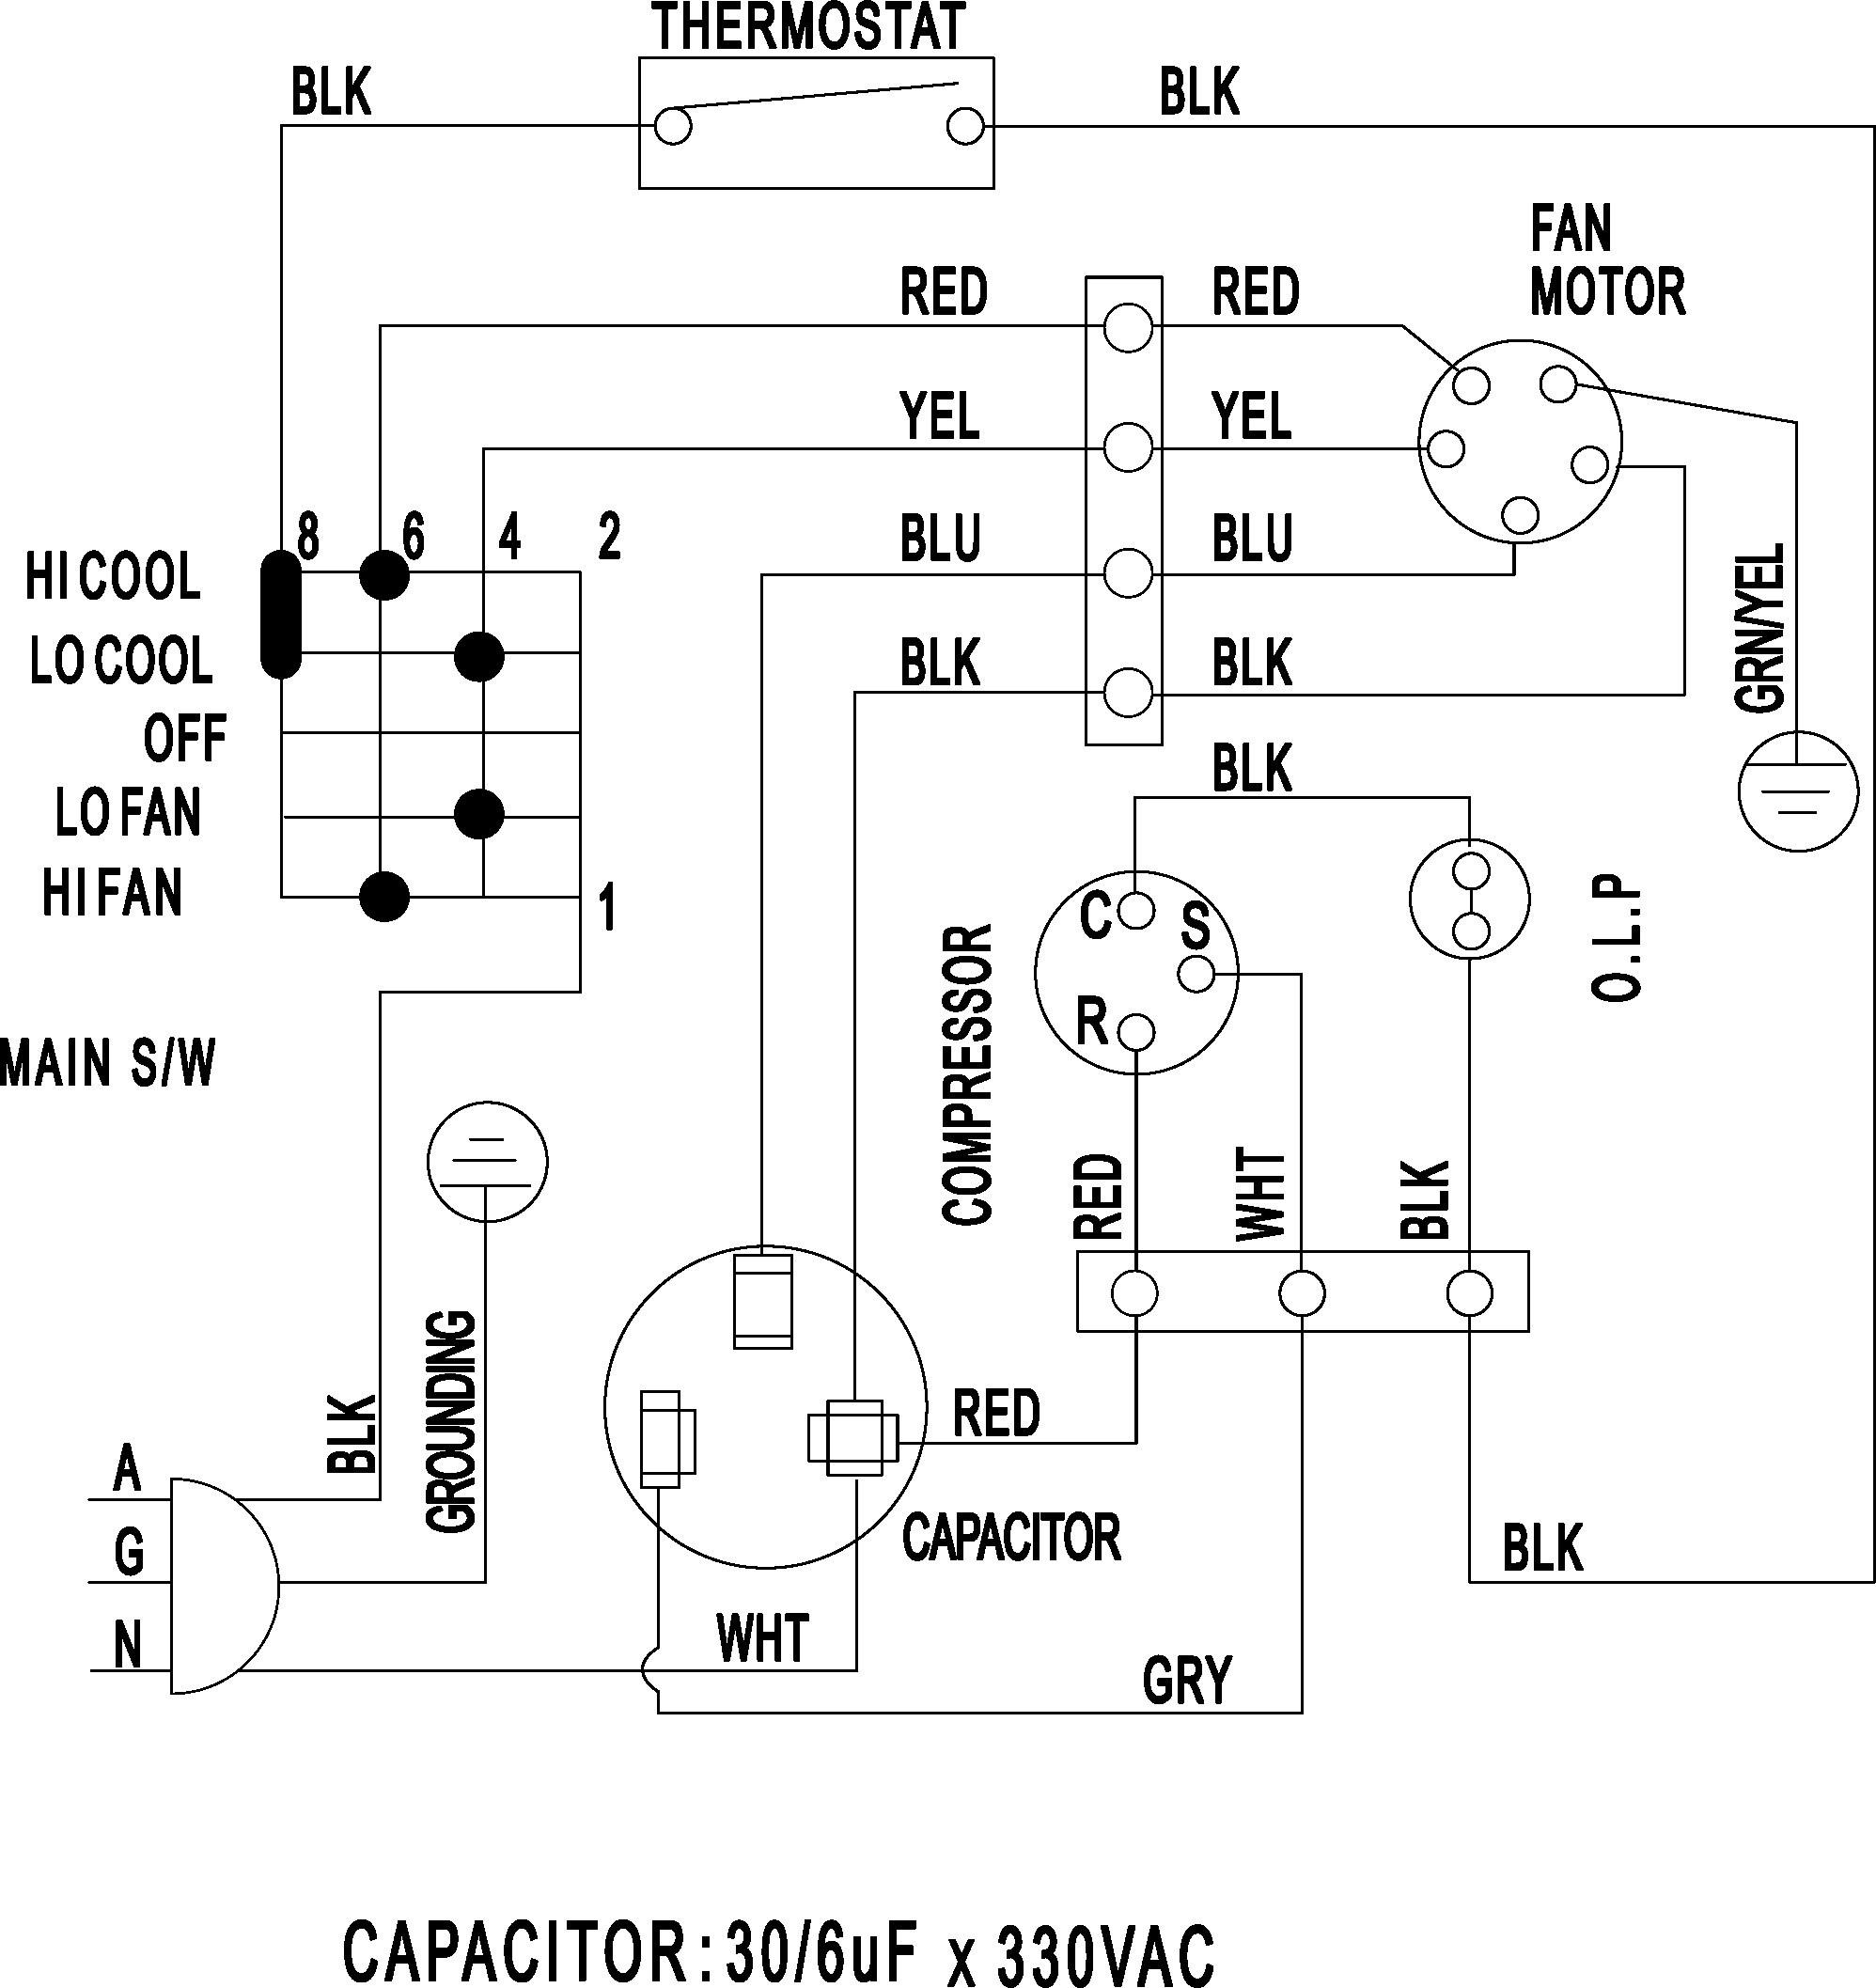 hight resolution of motor wiring diagram wirings diagram york wiring diagram heat pump york motor wiring diagram wiring diagram